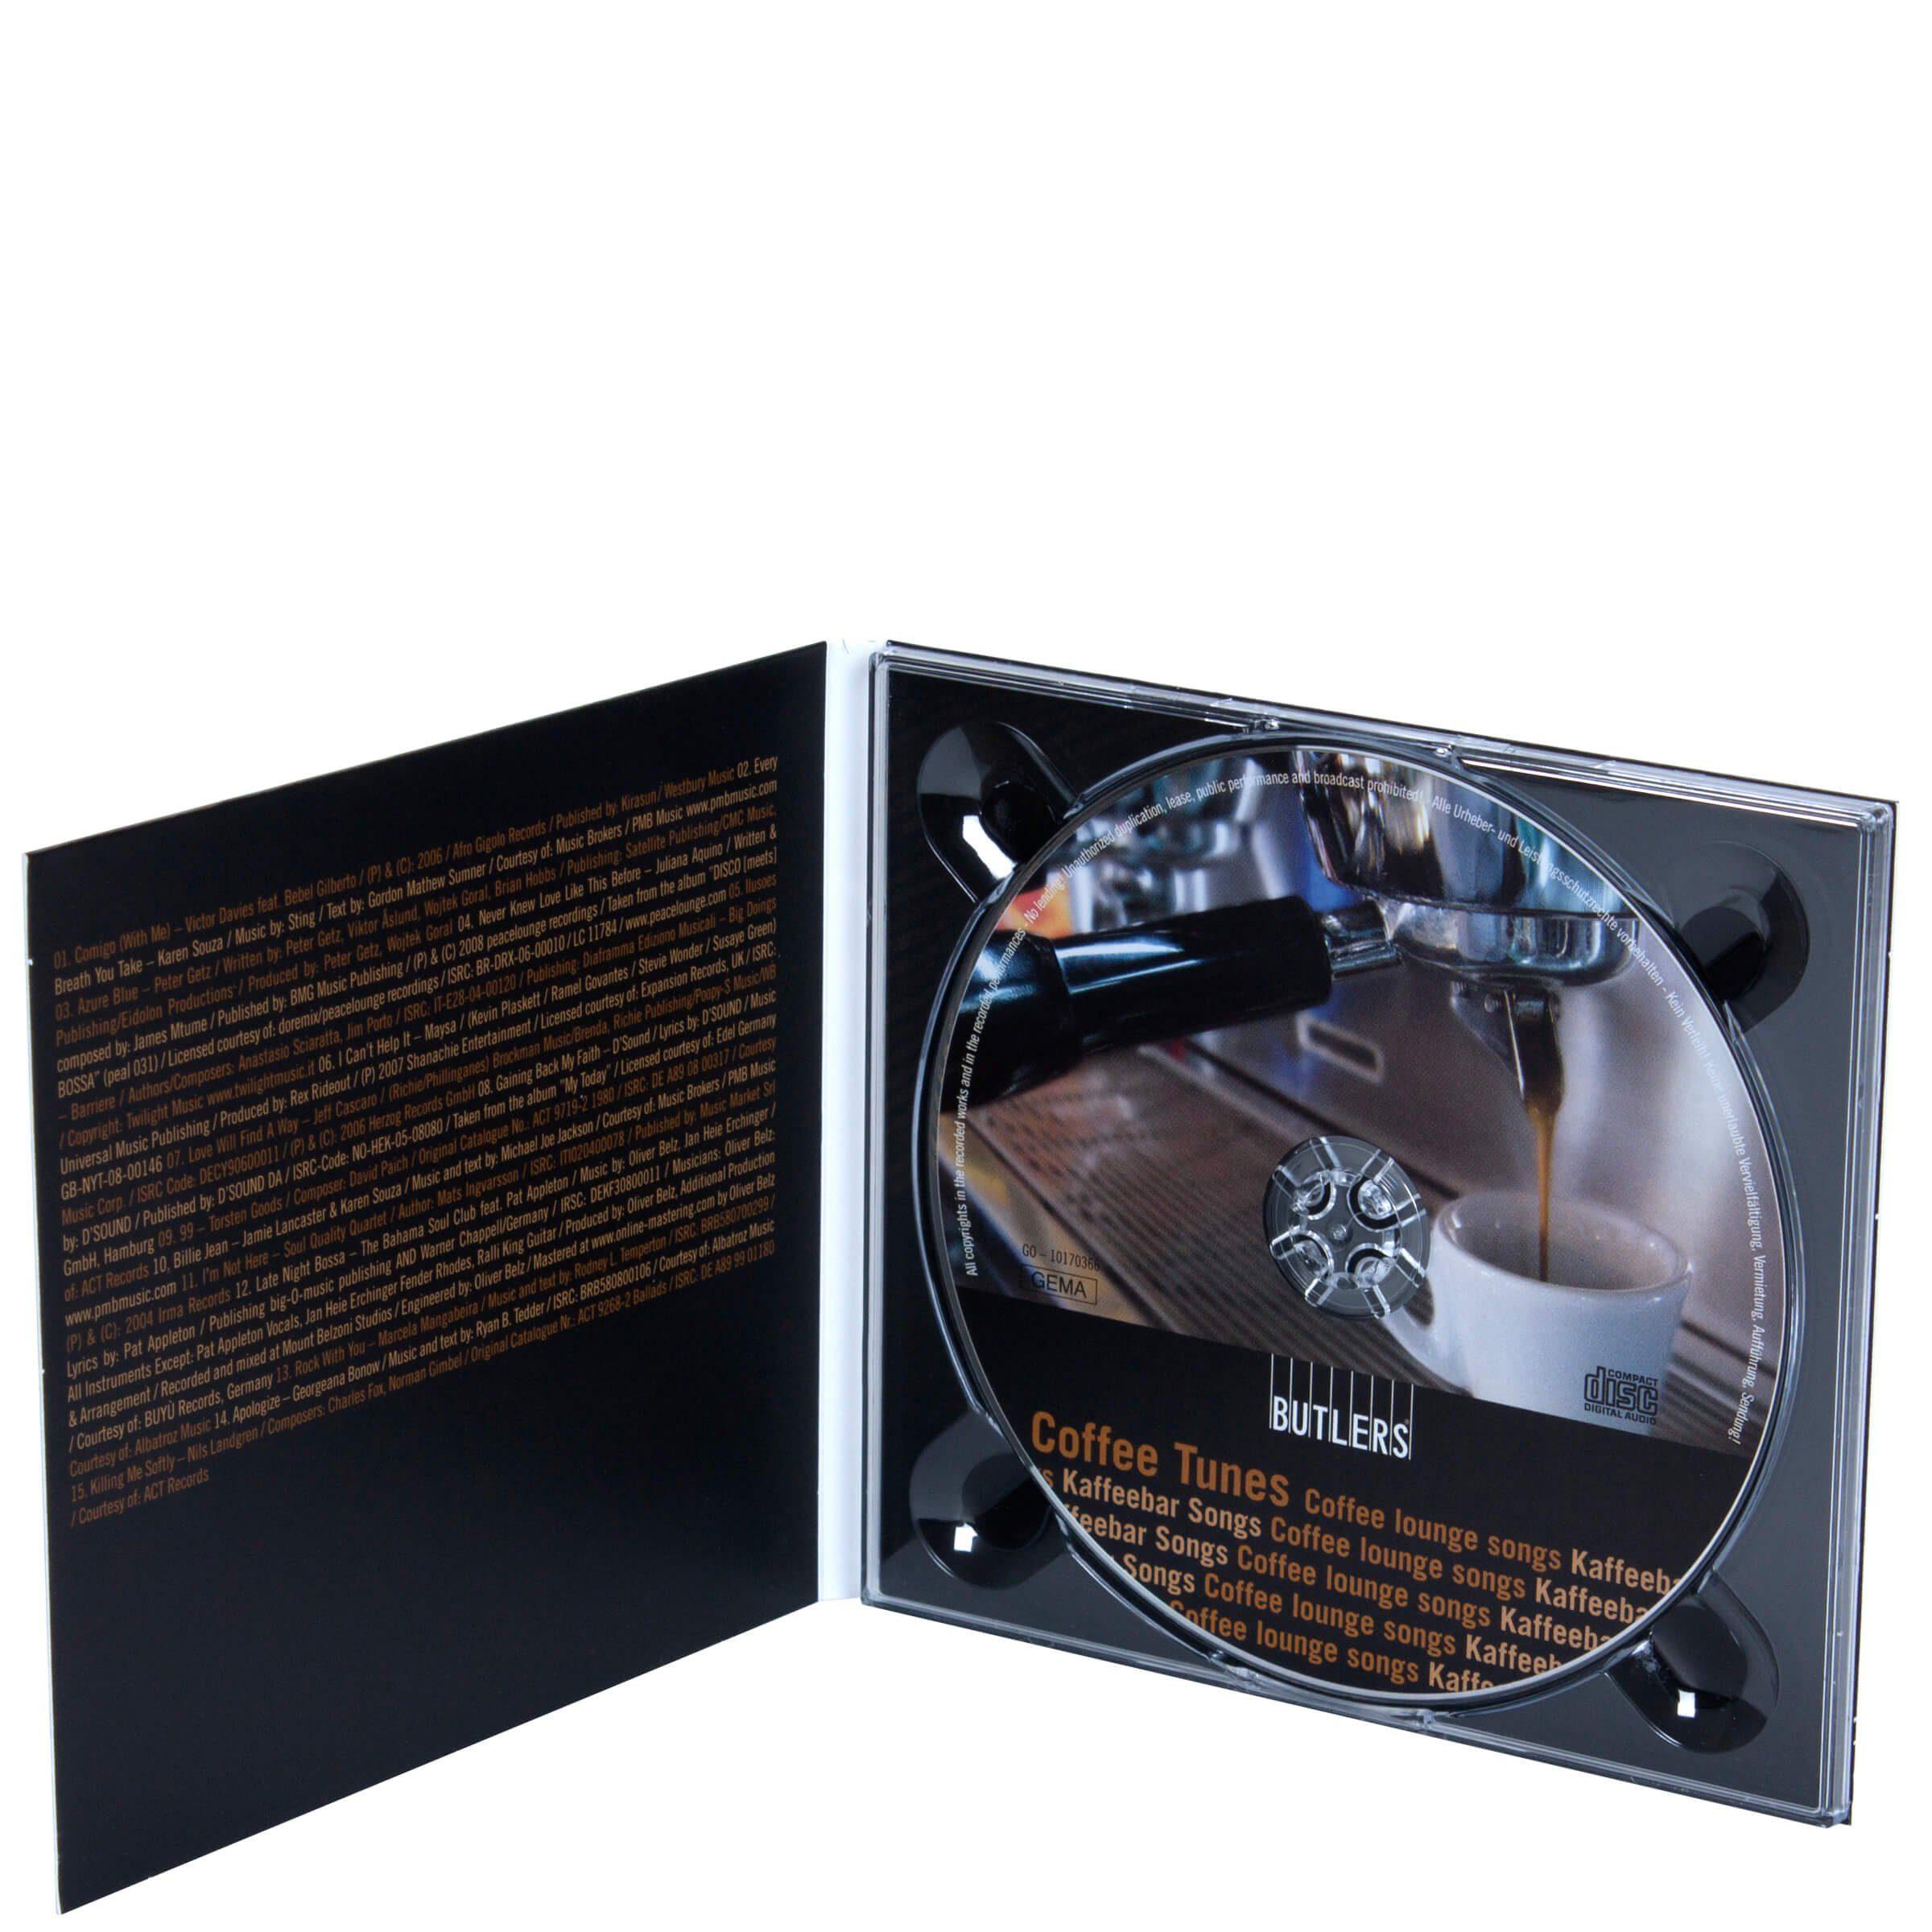 BUTLERS COFFEE TUNES CD »Kaffeebar Songs«